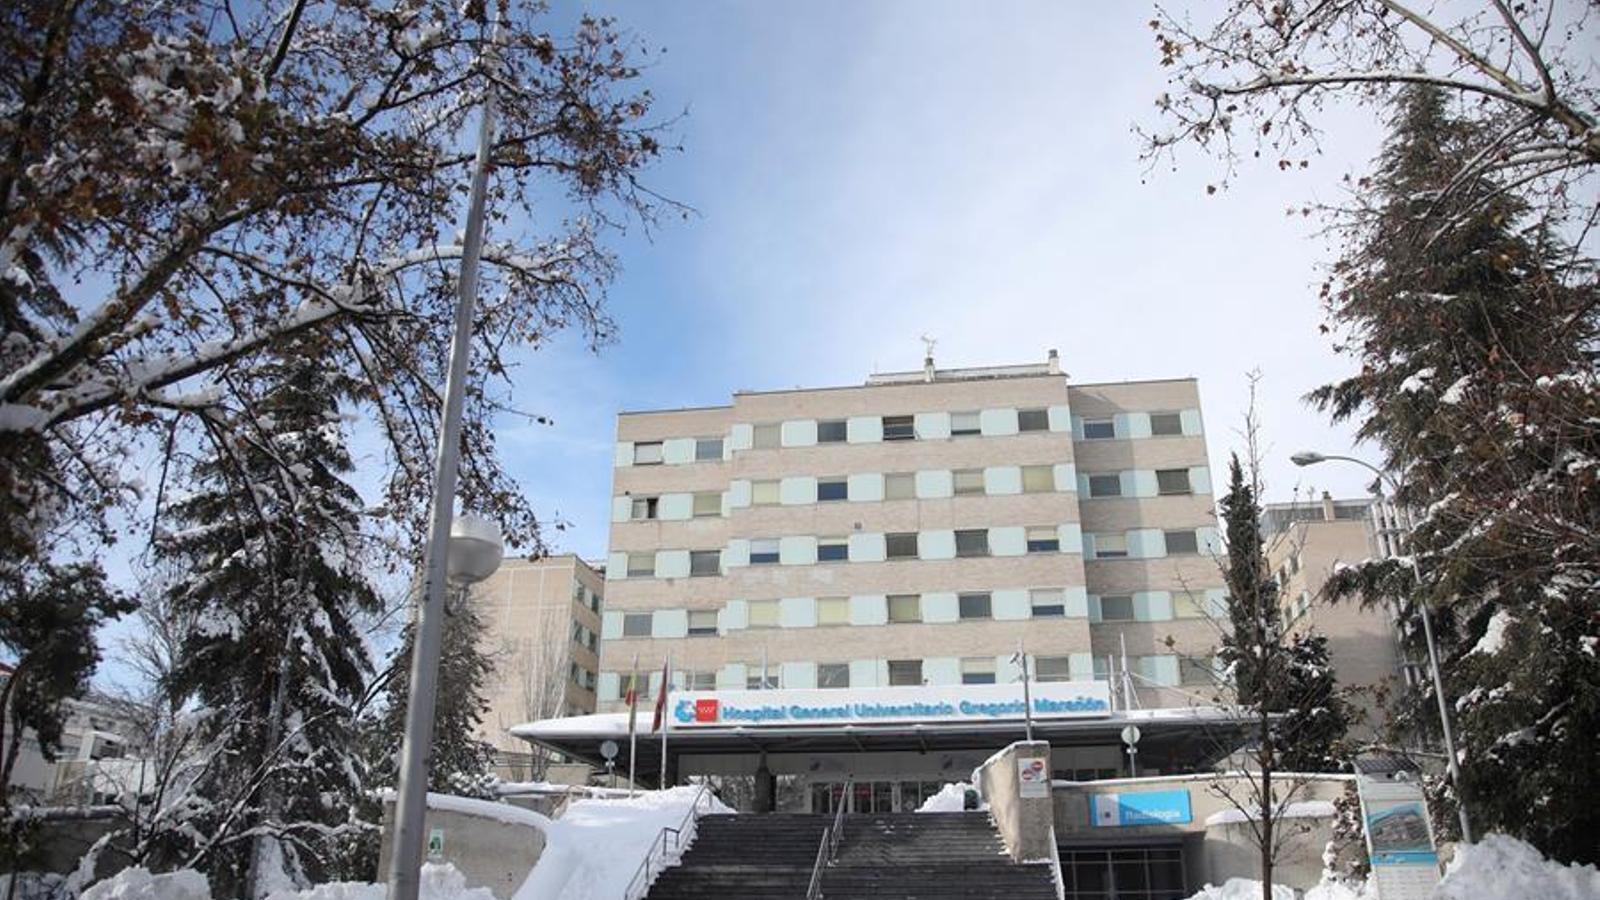 Entrada a l'hospital Gregorio Marañón de Madrid, aquest diumenge